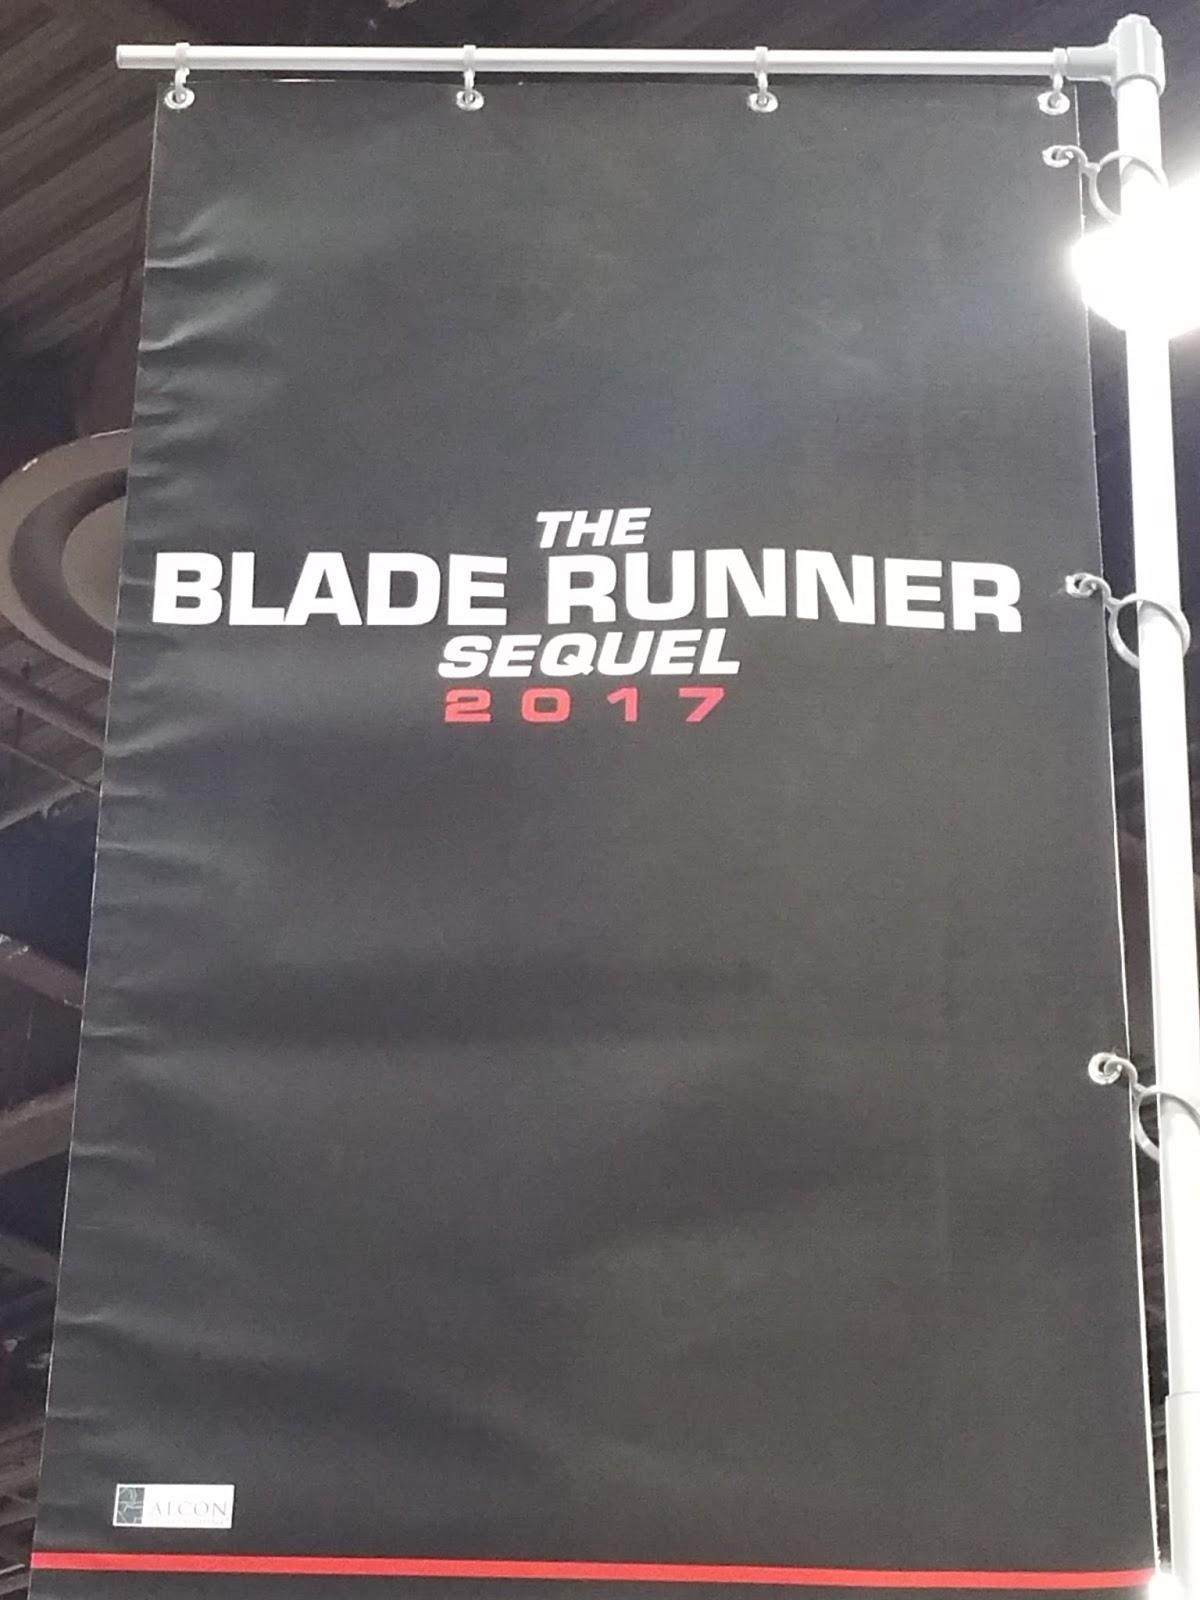 (NEWS) Blade Runner 2 is getting closer - Ryan Gosling ... - photo#34